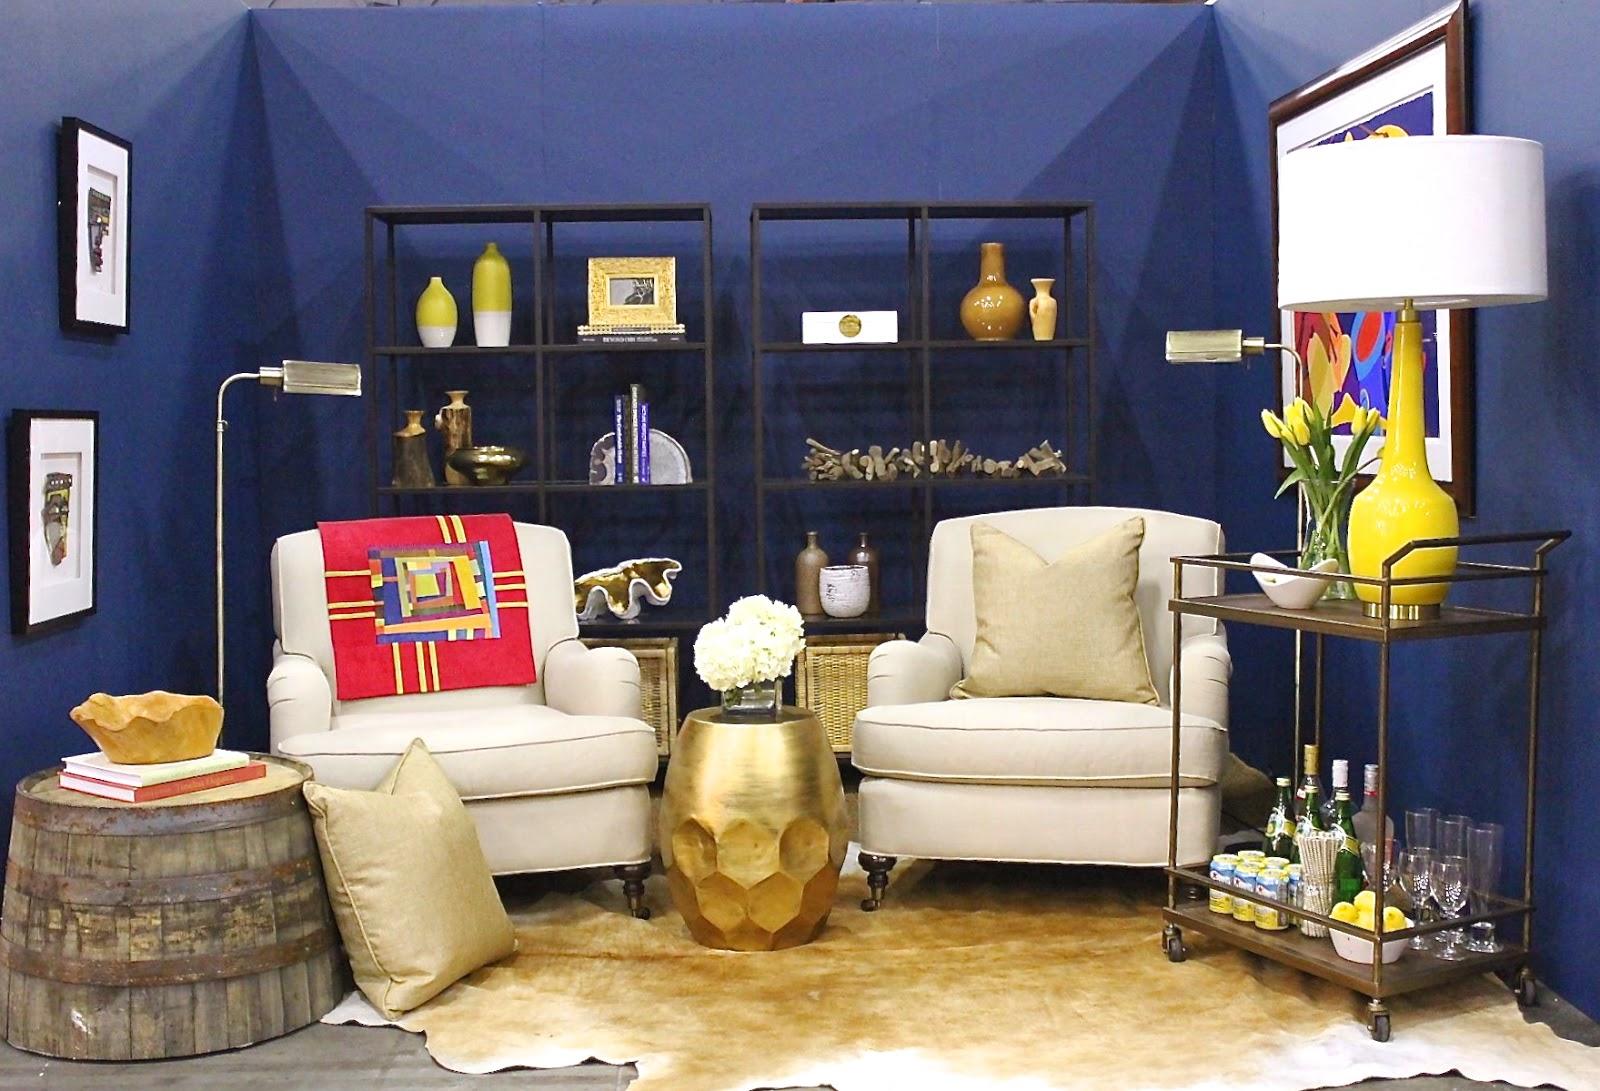 American craft council show design indulgence for American craft council show